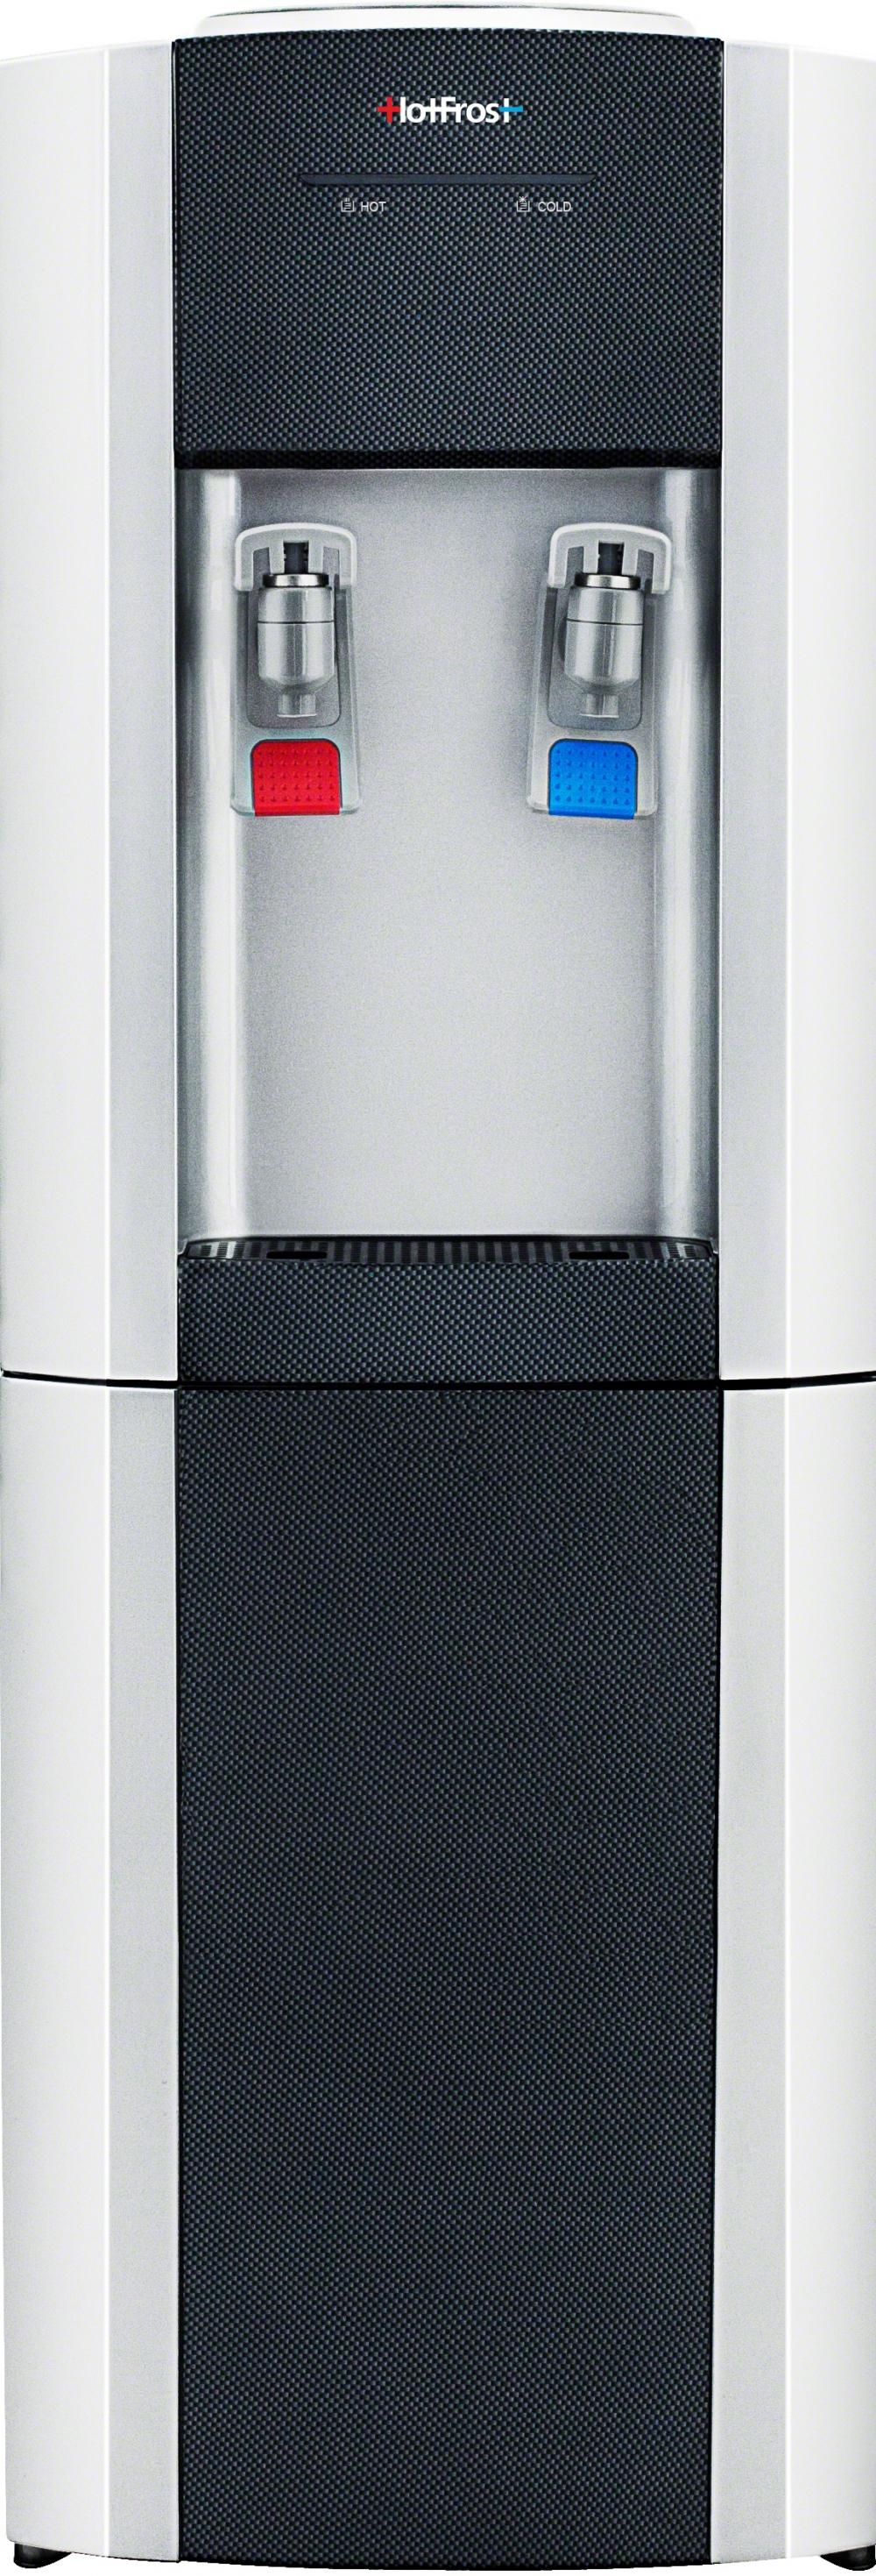 HotFrost V710CES carbon